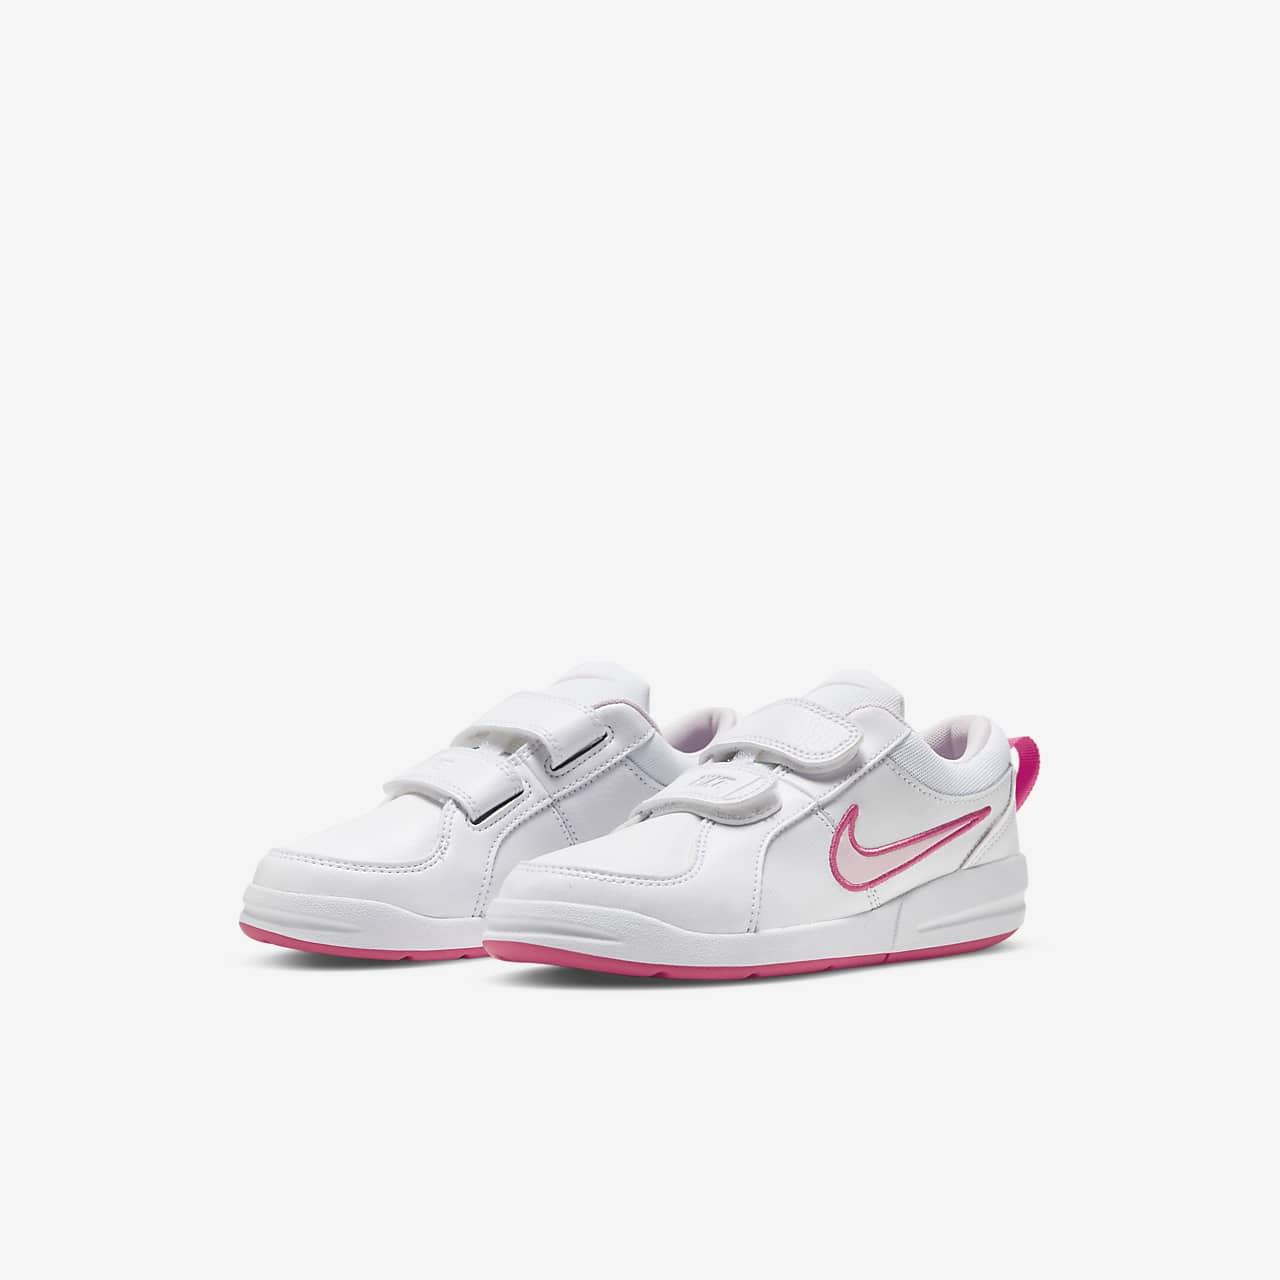 b8d29f891a7c4 Nike Pico 4 — Chaussure pour Petite fille. Nike.com CA